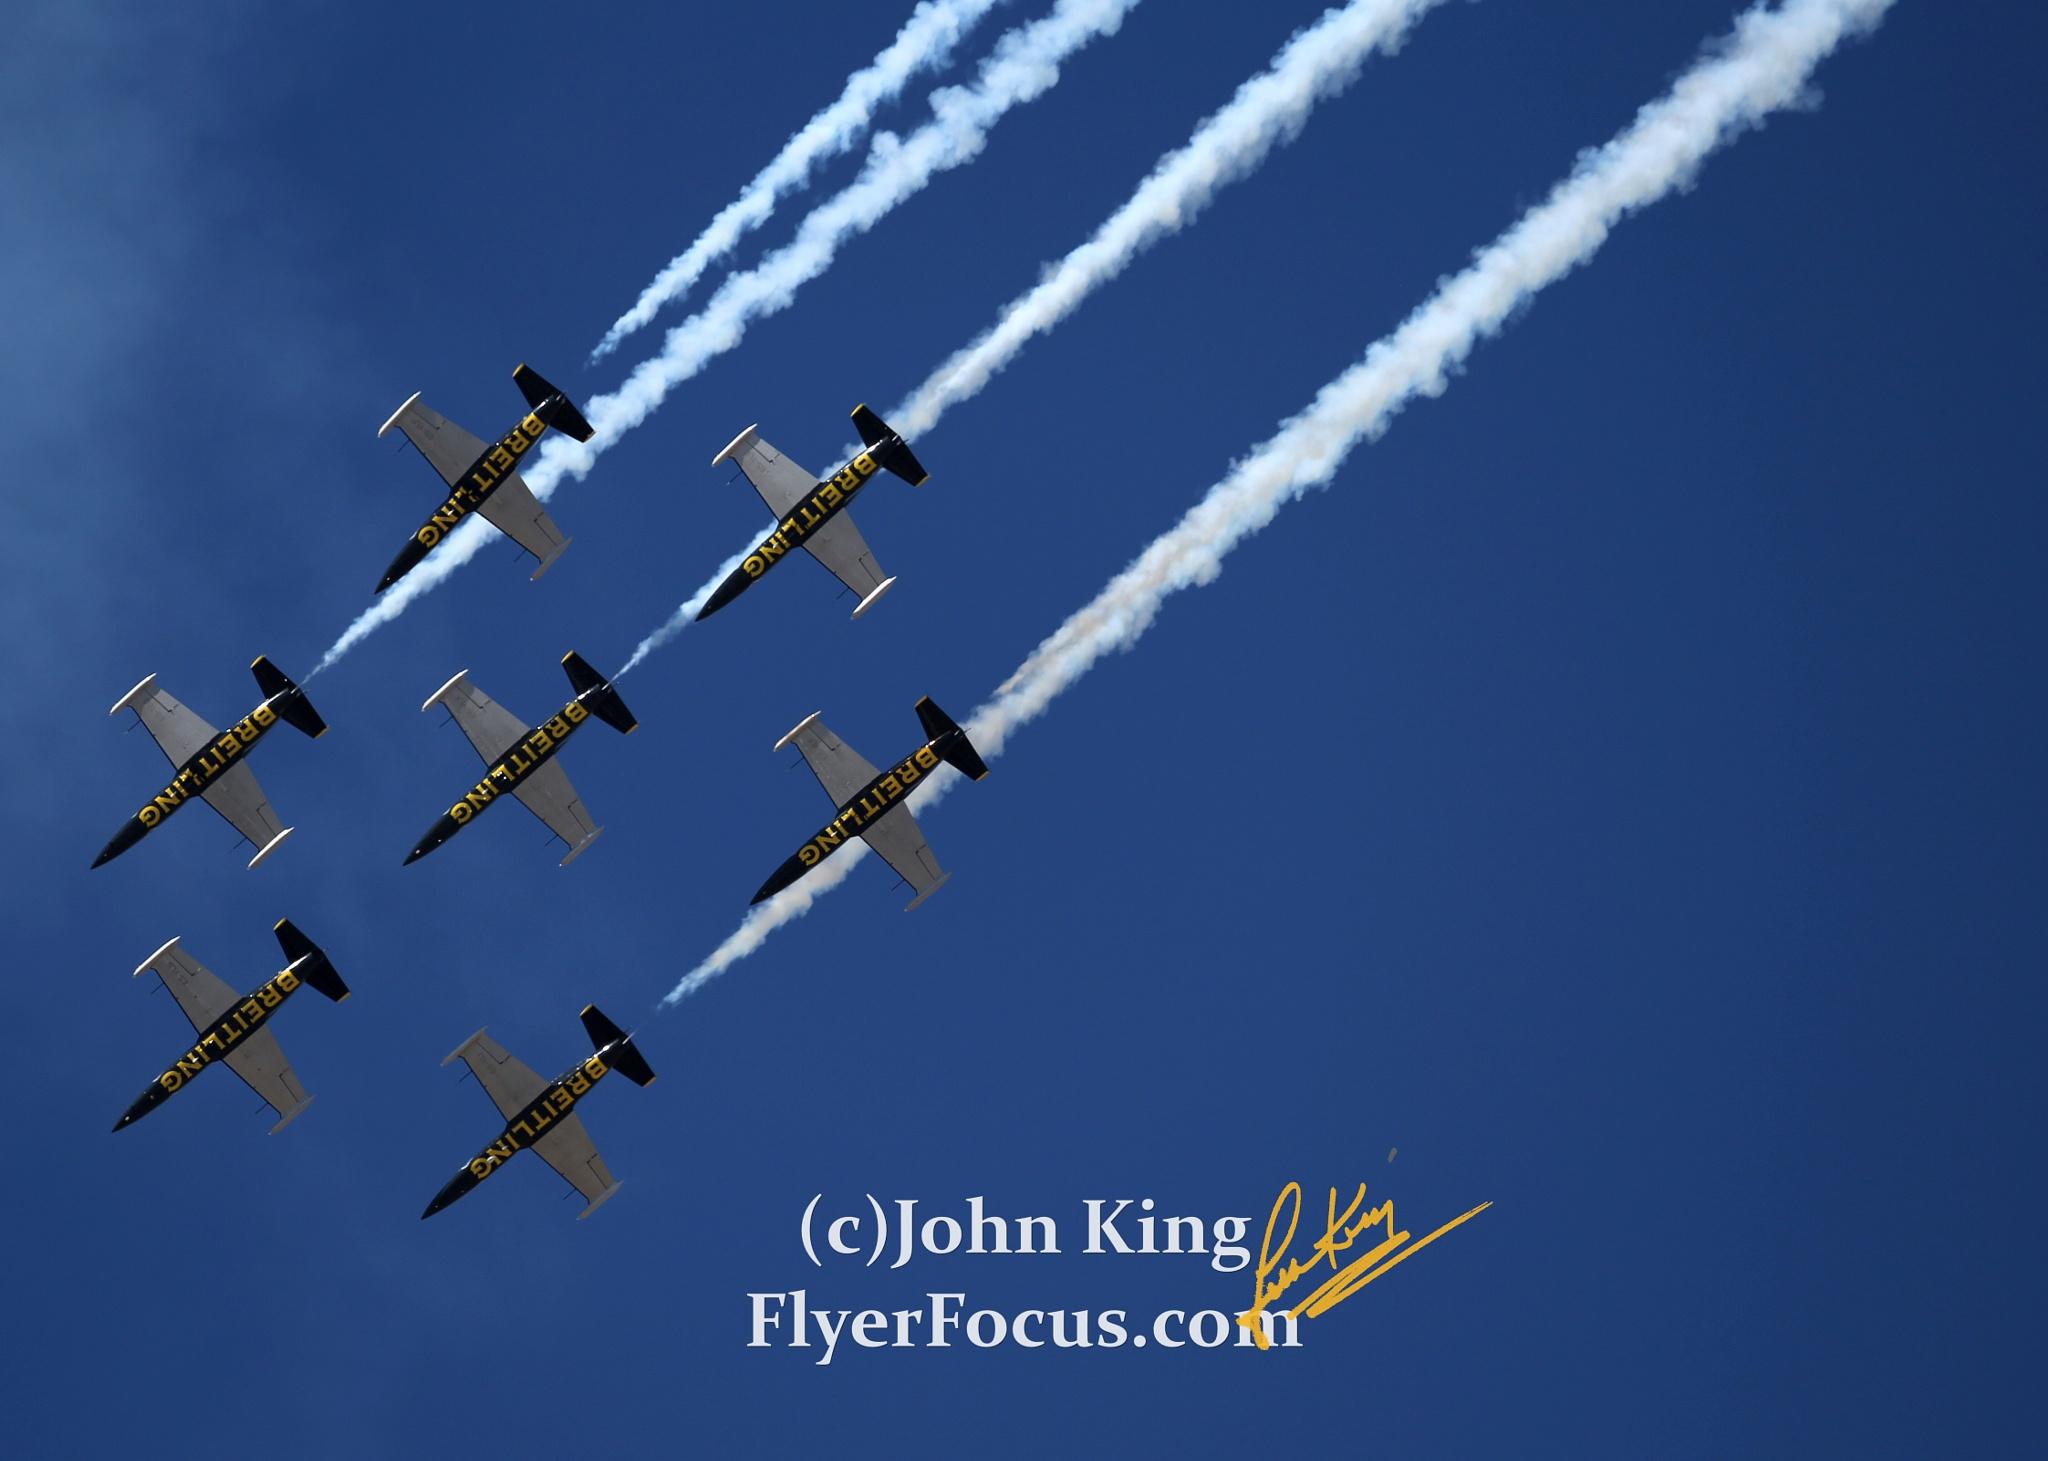 Breitling Team Performs at Reno Air Races by John King (ig: FlyerFocus)